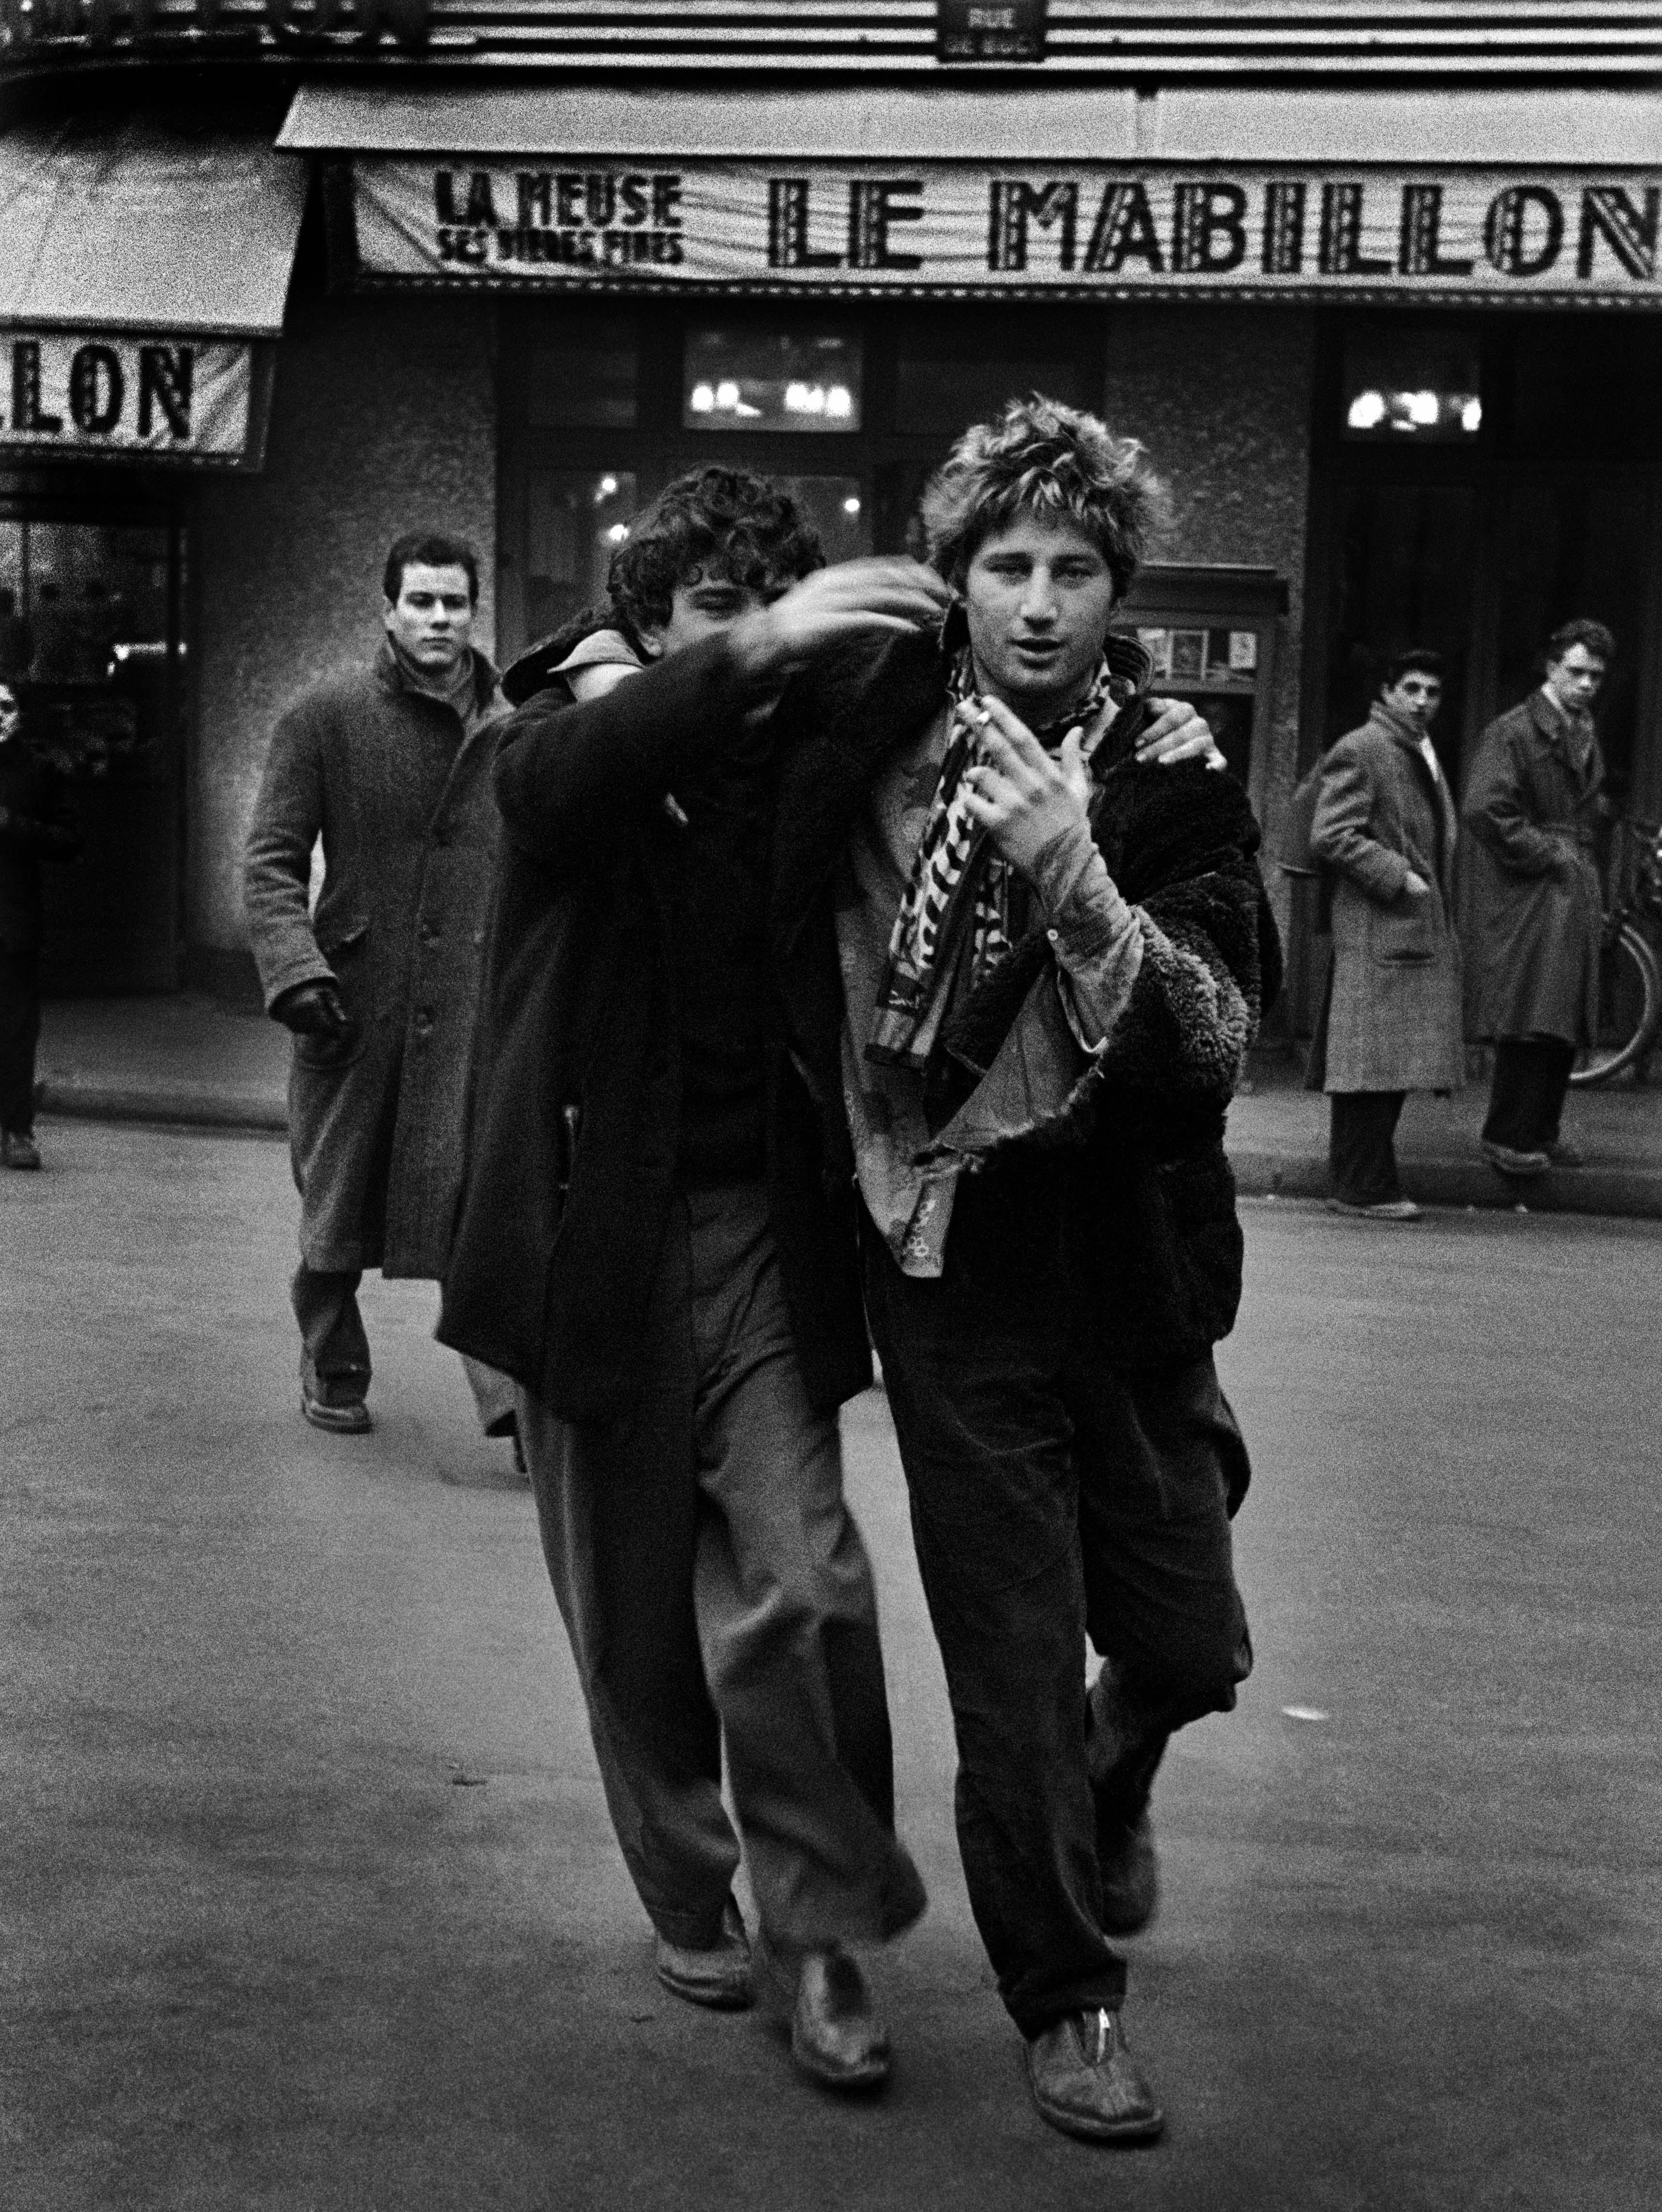 Ed van der Elsken, Jean-Michel Mension (Pierre ) et Auguste Hommel (Benny) devant le Mabillon, Paris, 1953. Nederlands Fotomuseum Rotterdam © Ed van der Elsken / Ed van der Elsken Estate